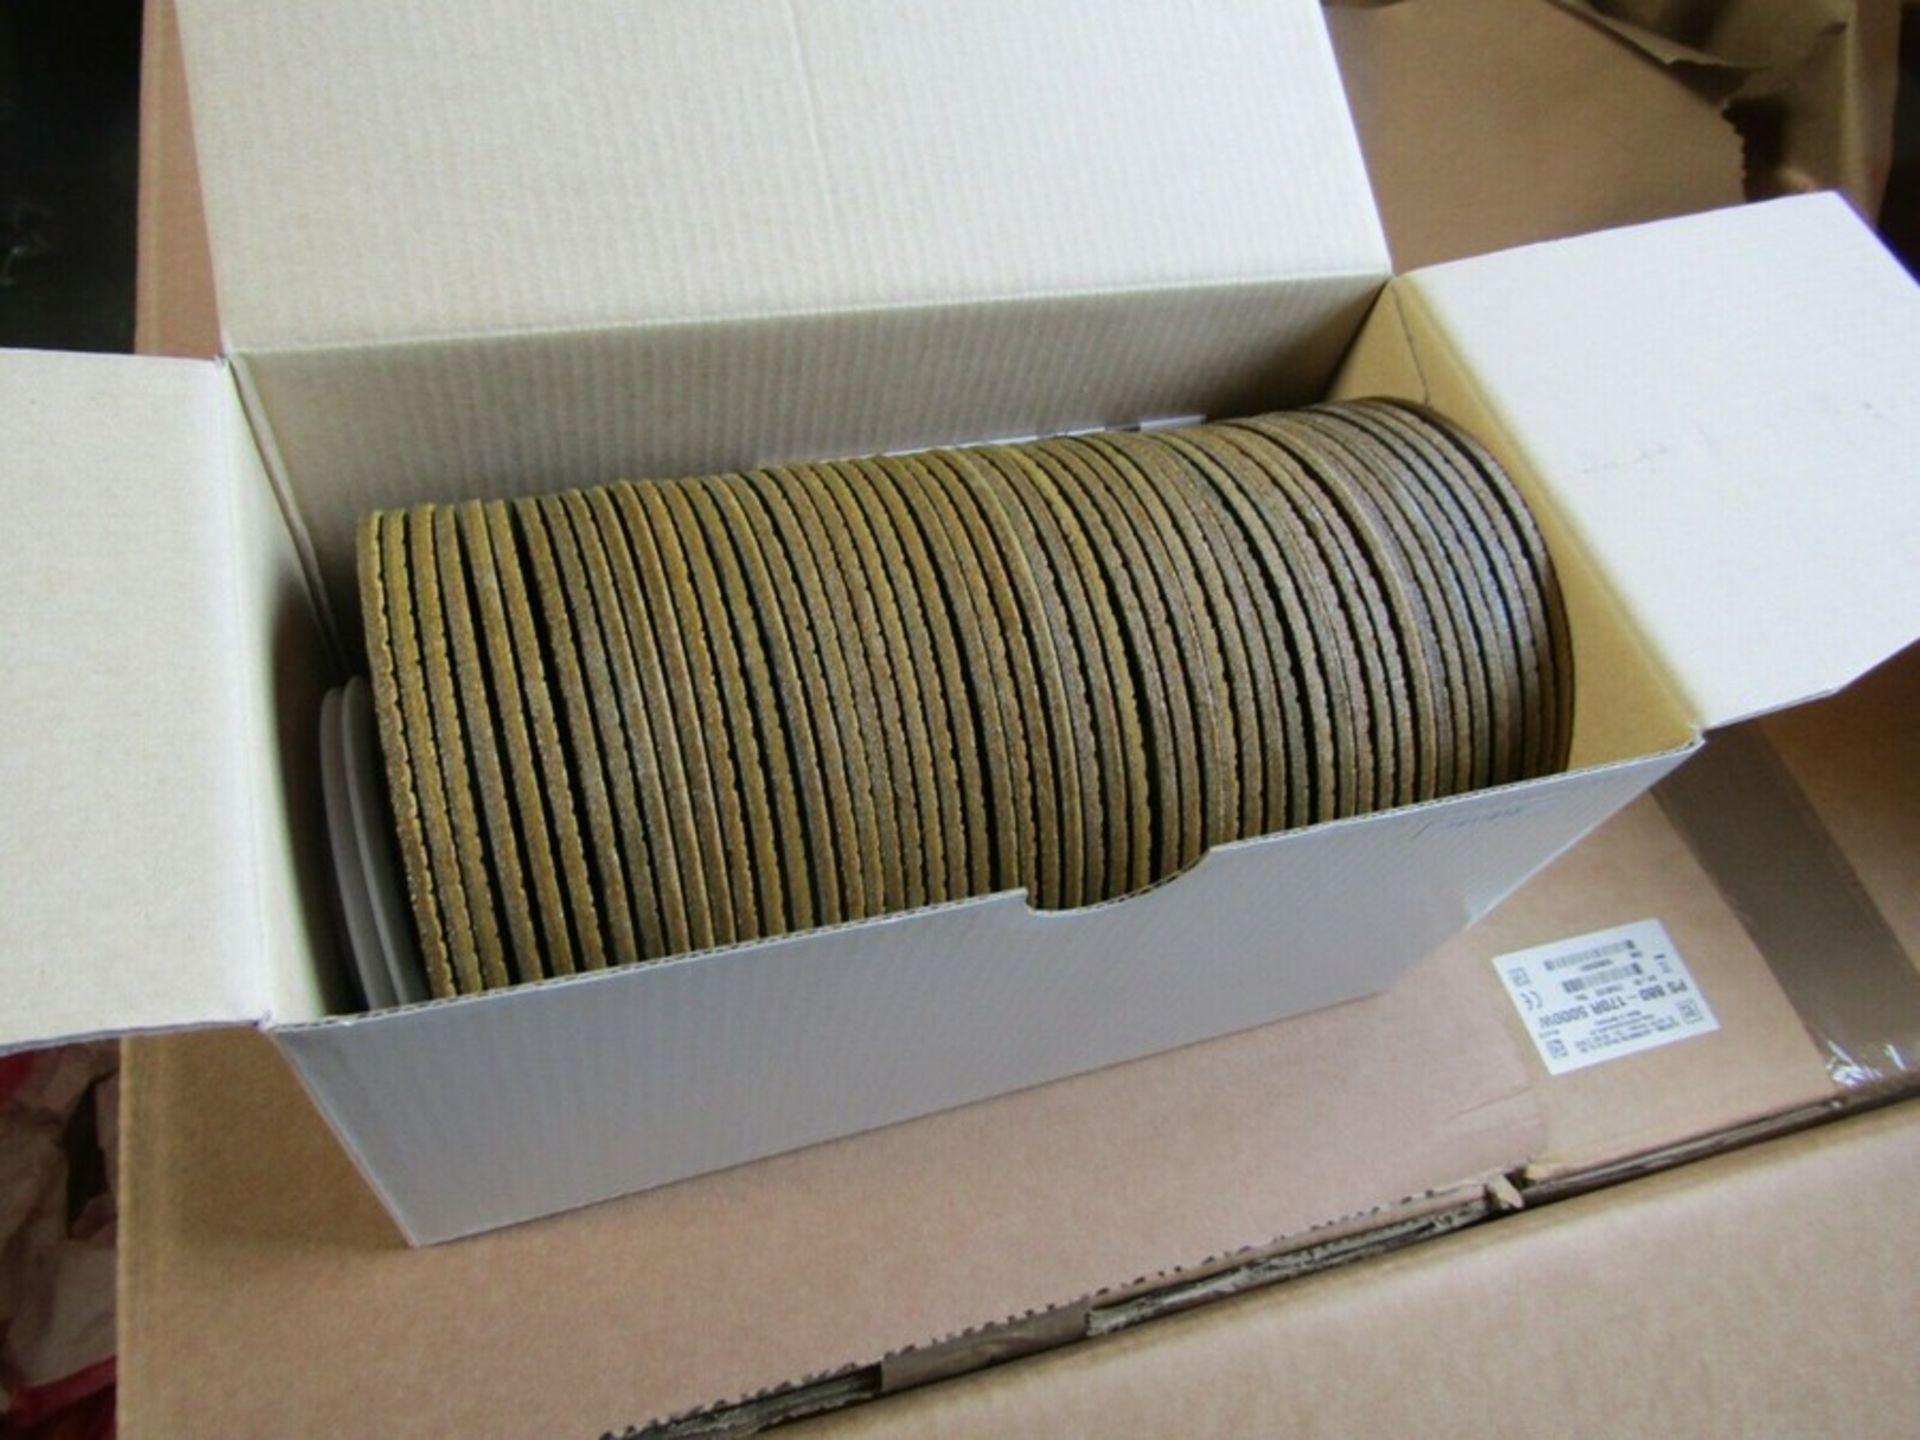 BOX of 50 x 3M Cubitron II Ceramic Grinding Wheel 115mm Dia P80 Grit 3m 01793495 - Image 2 of 3